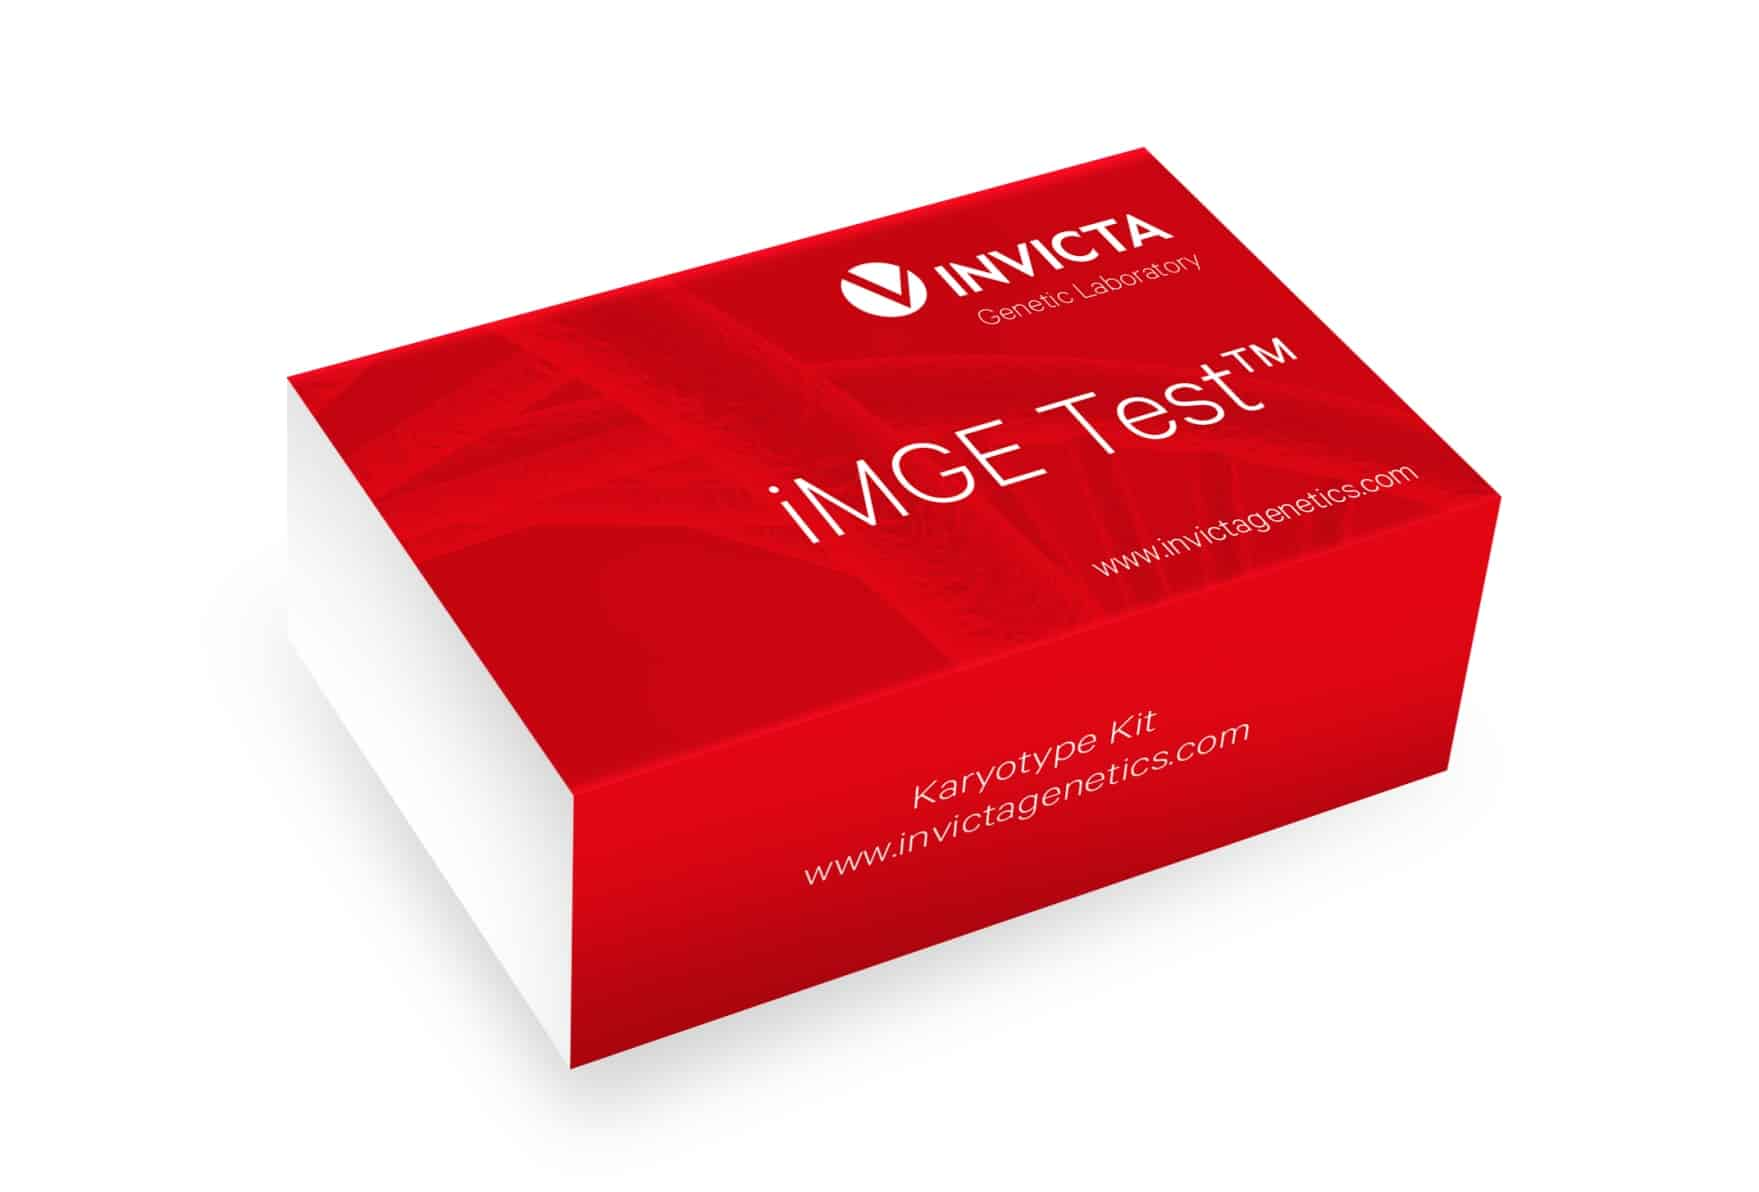 <h5>iMGE Test™</h5>